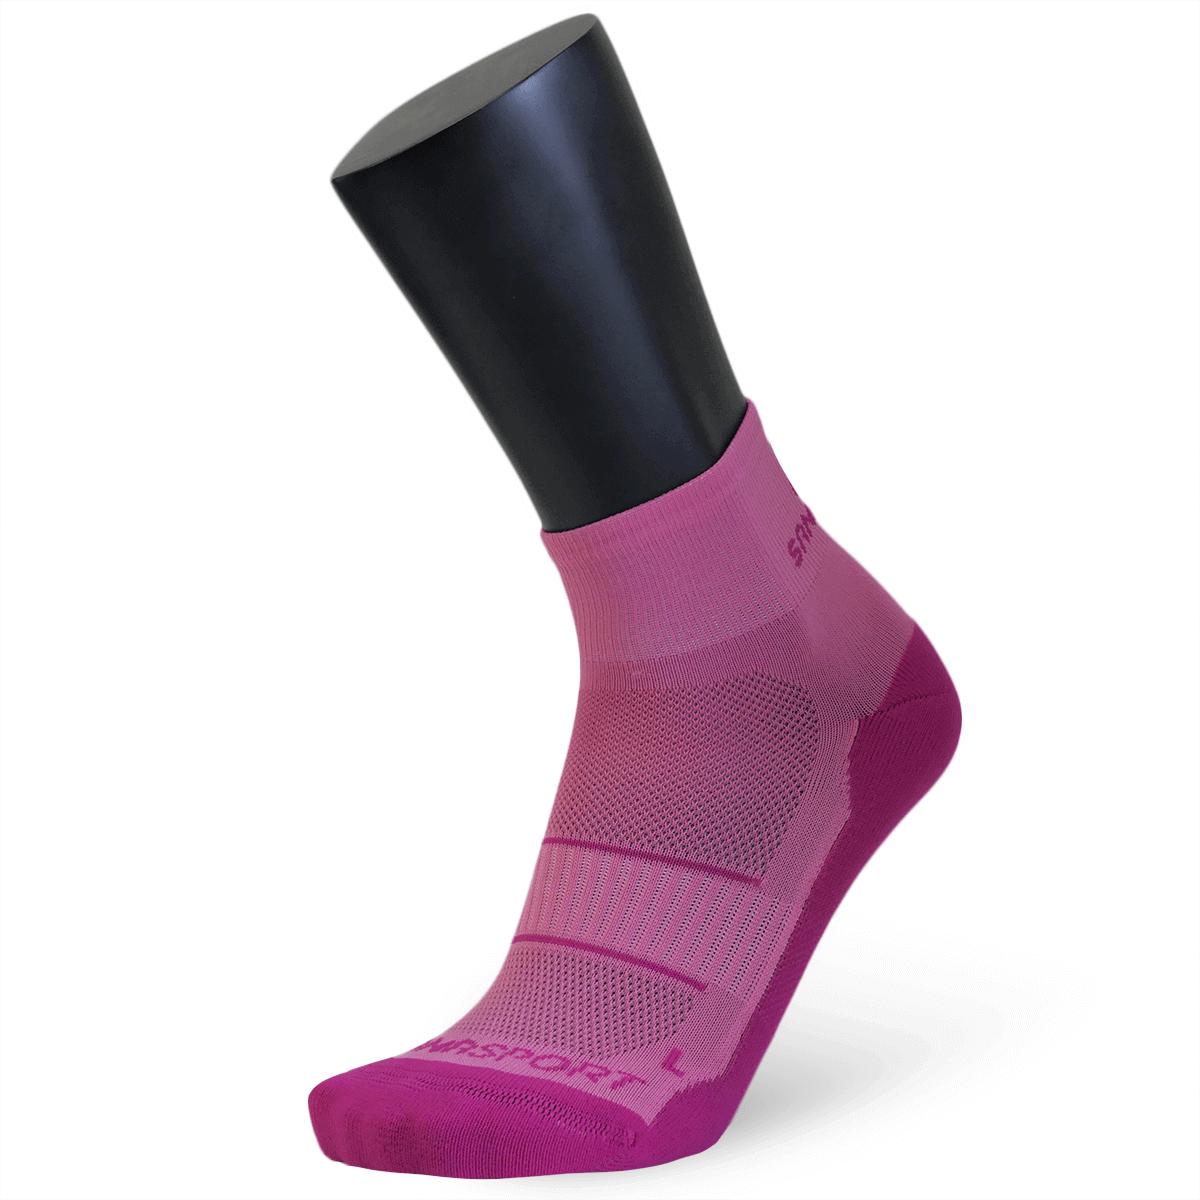 Bežecké ponožky Moose Training Mid Socks